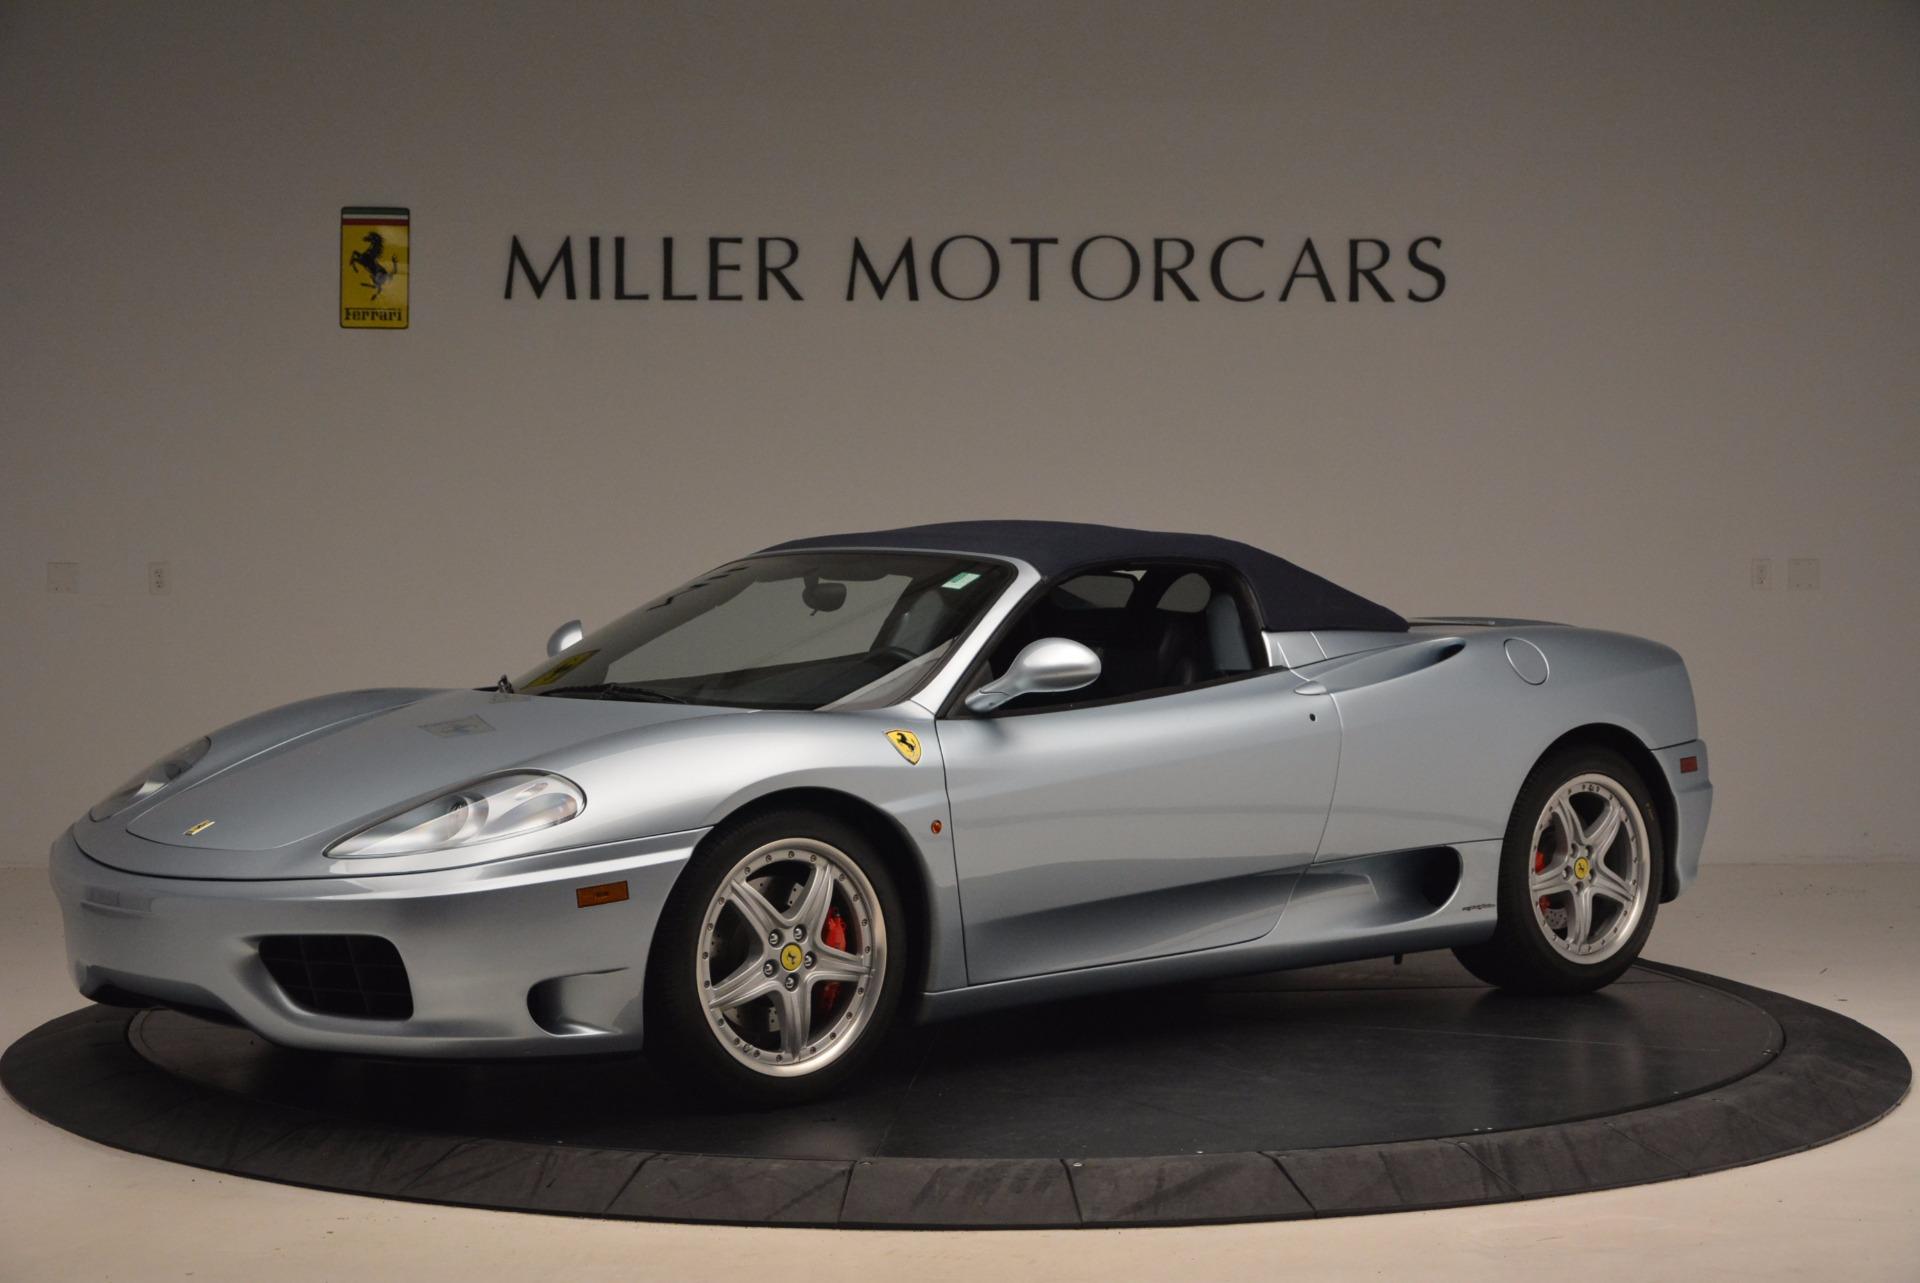 Used 2003 Ferrari 360 Spider 6-Speed Manual For Sale In Westport, CT 1445_p14